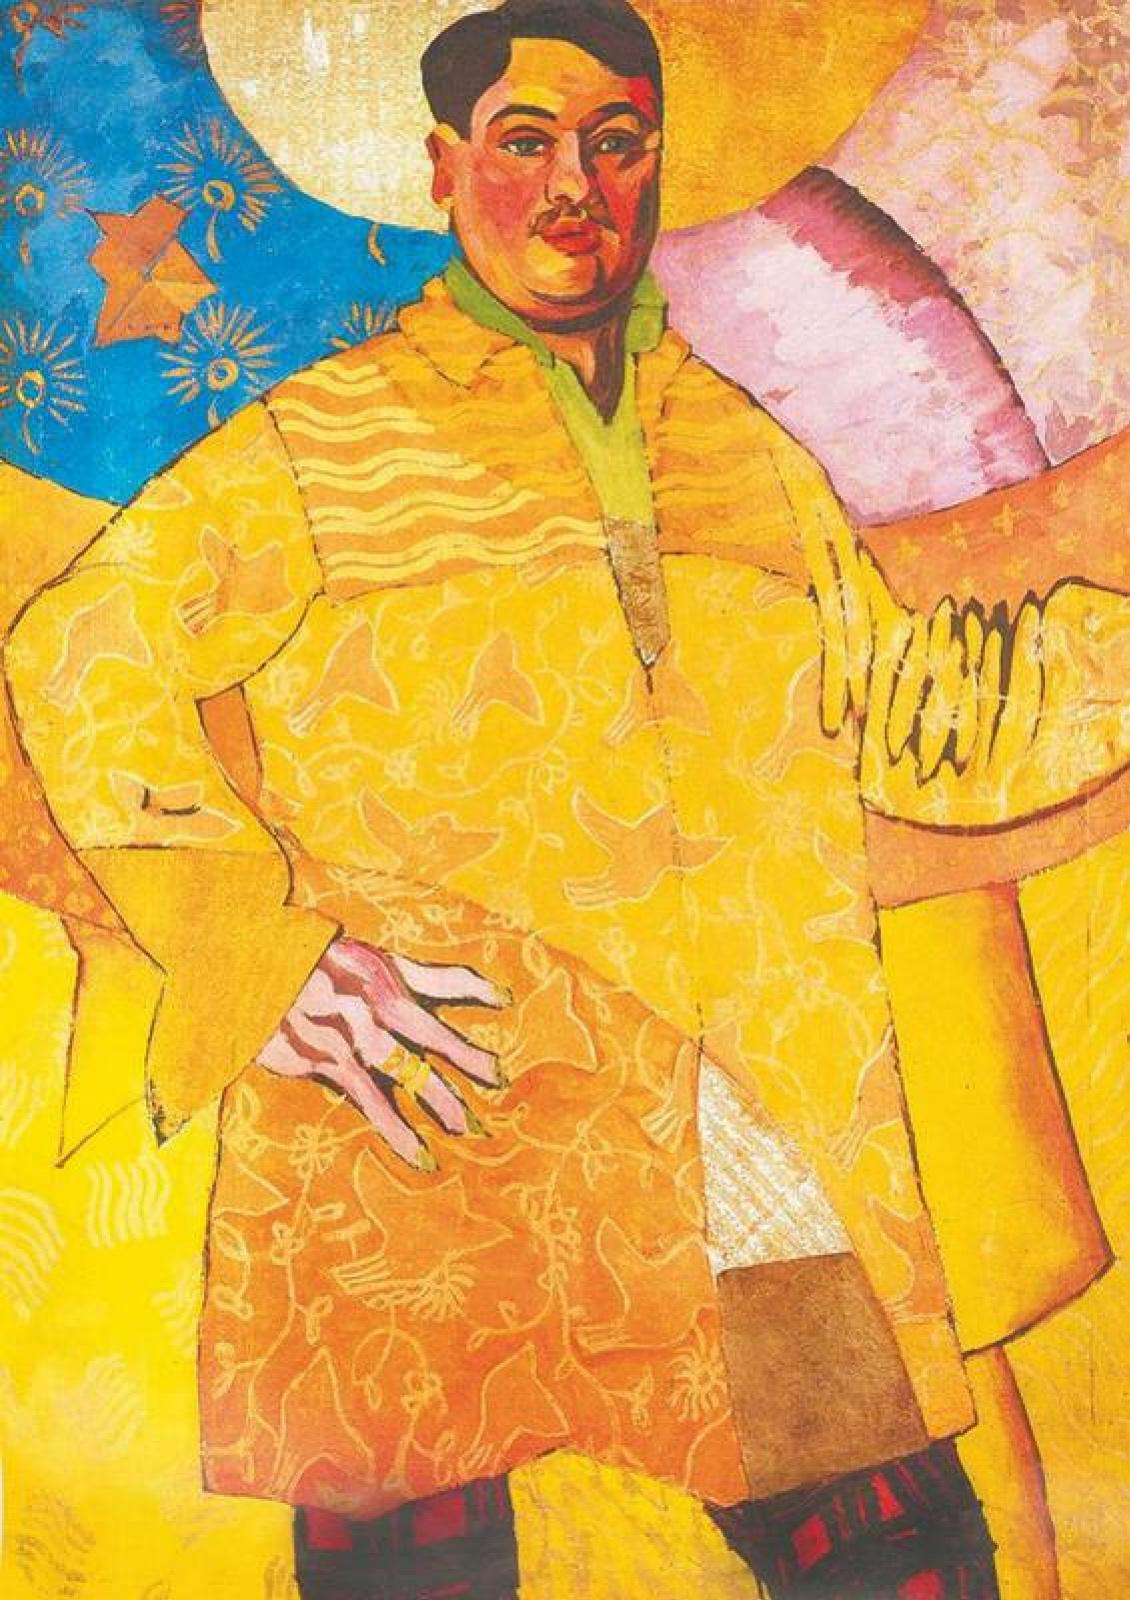 Аристарх Васильевич Лентулов. Автопортрет «Великий художник» (Le Grand Peintre)